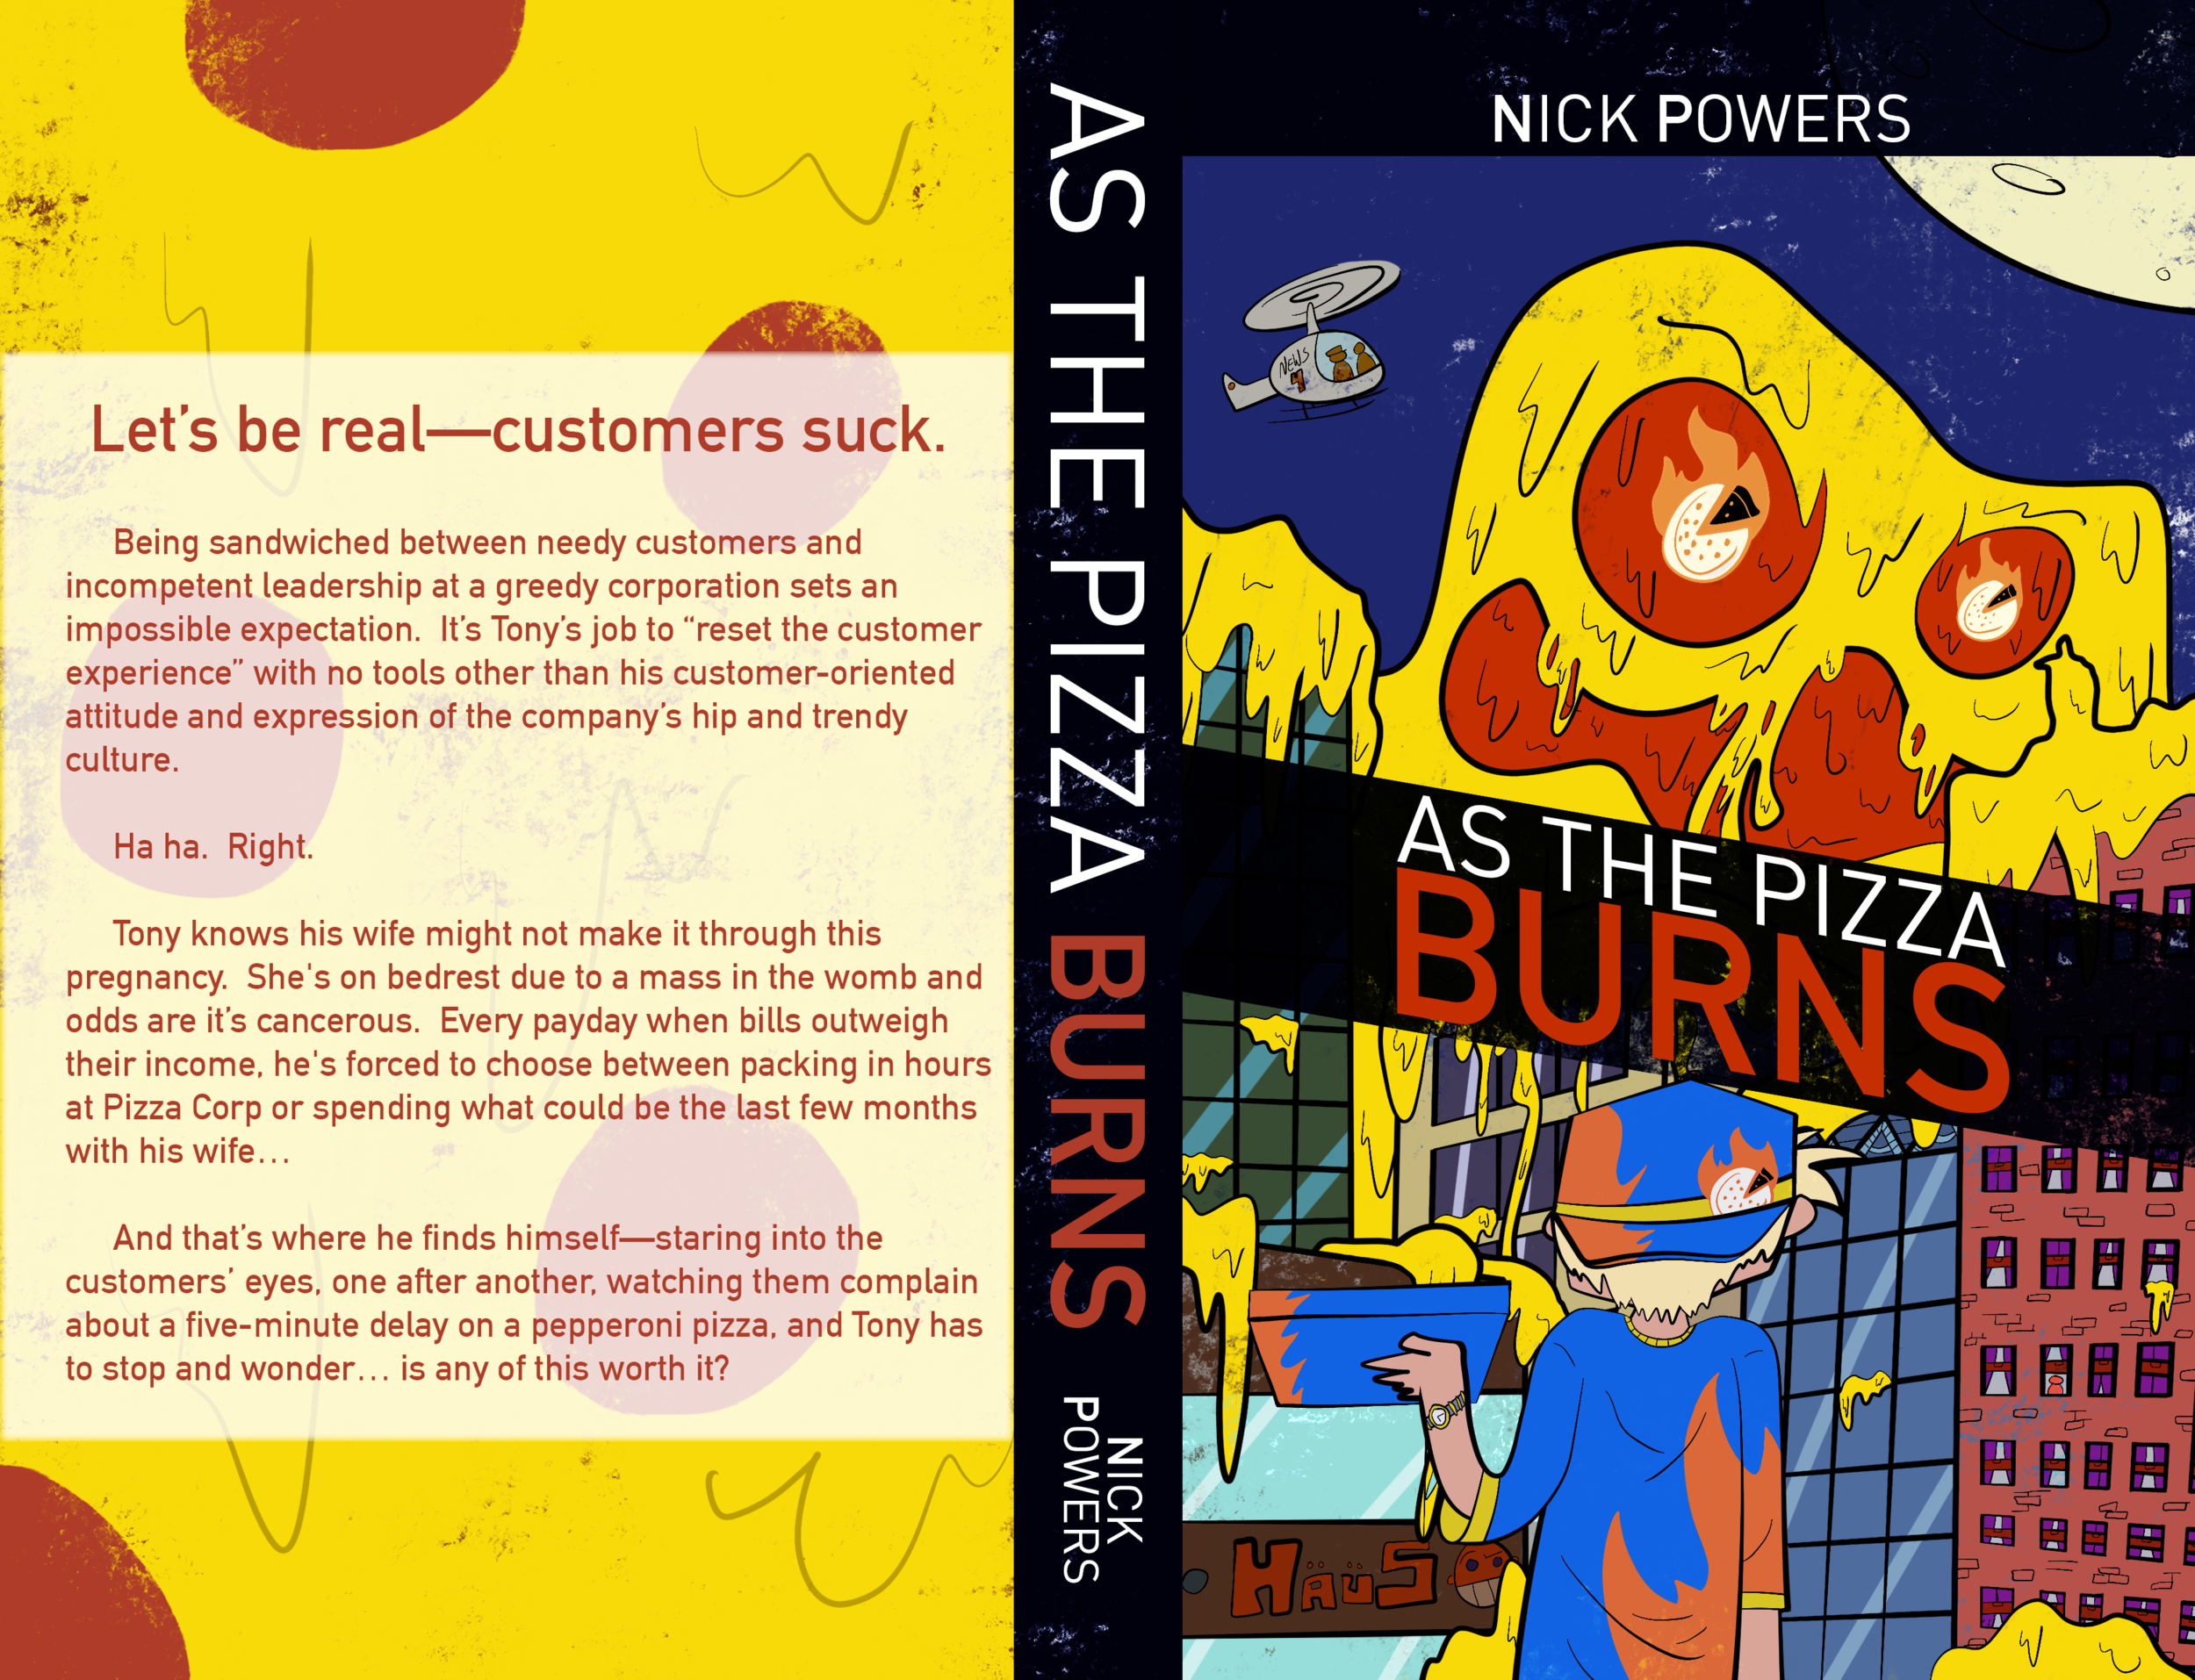 As the Pizza Burns Nicholas Powers